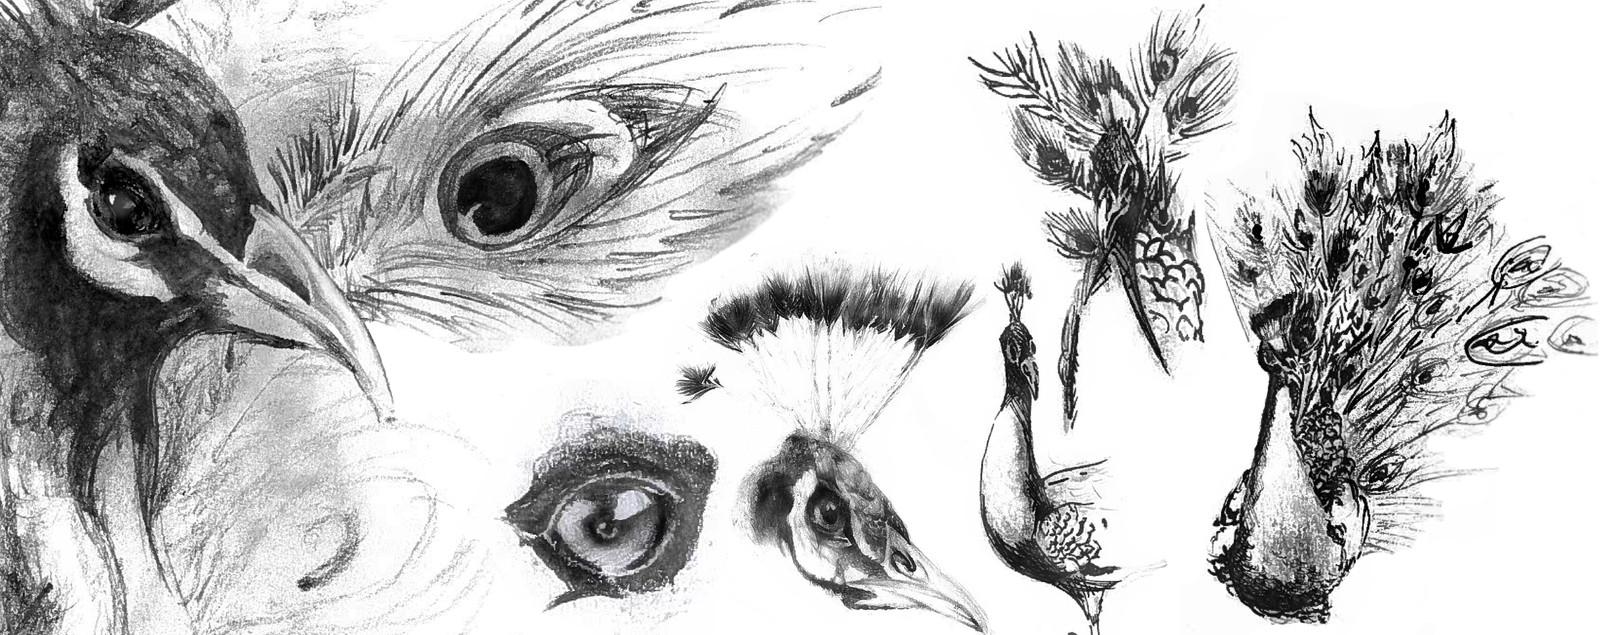 Inspiration peacock sketches